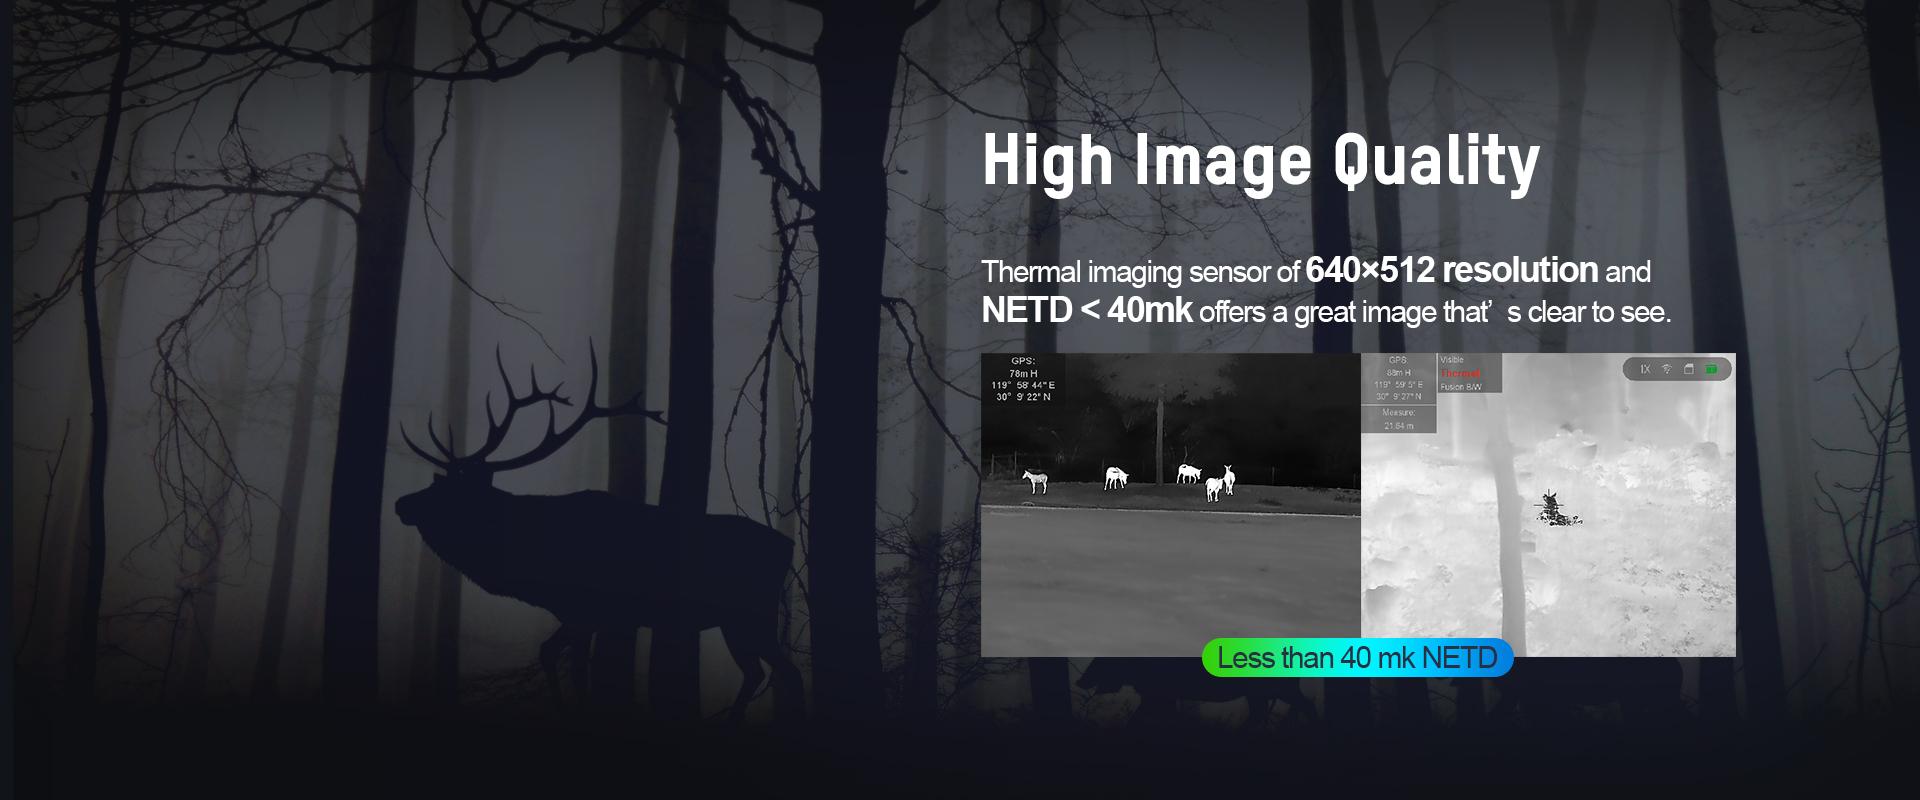 01-High Image Quality_TS16.jpg